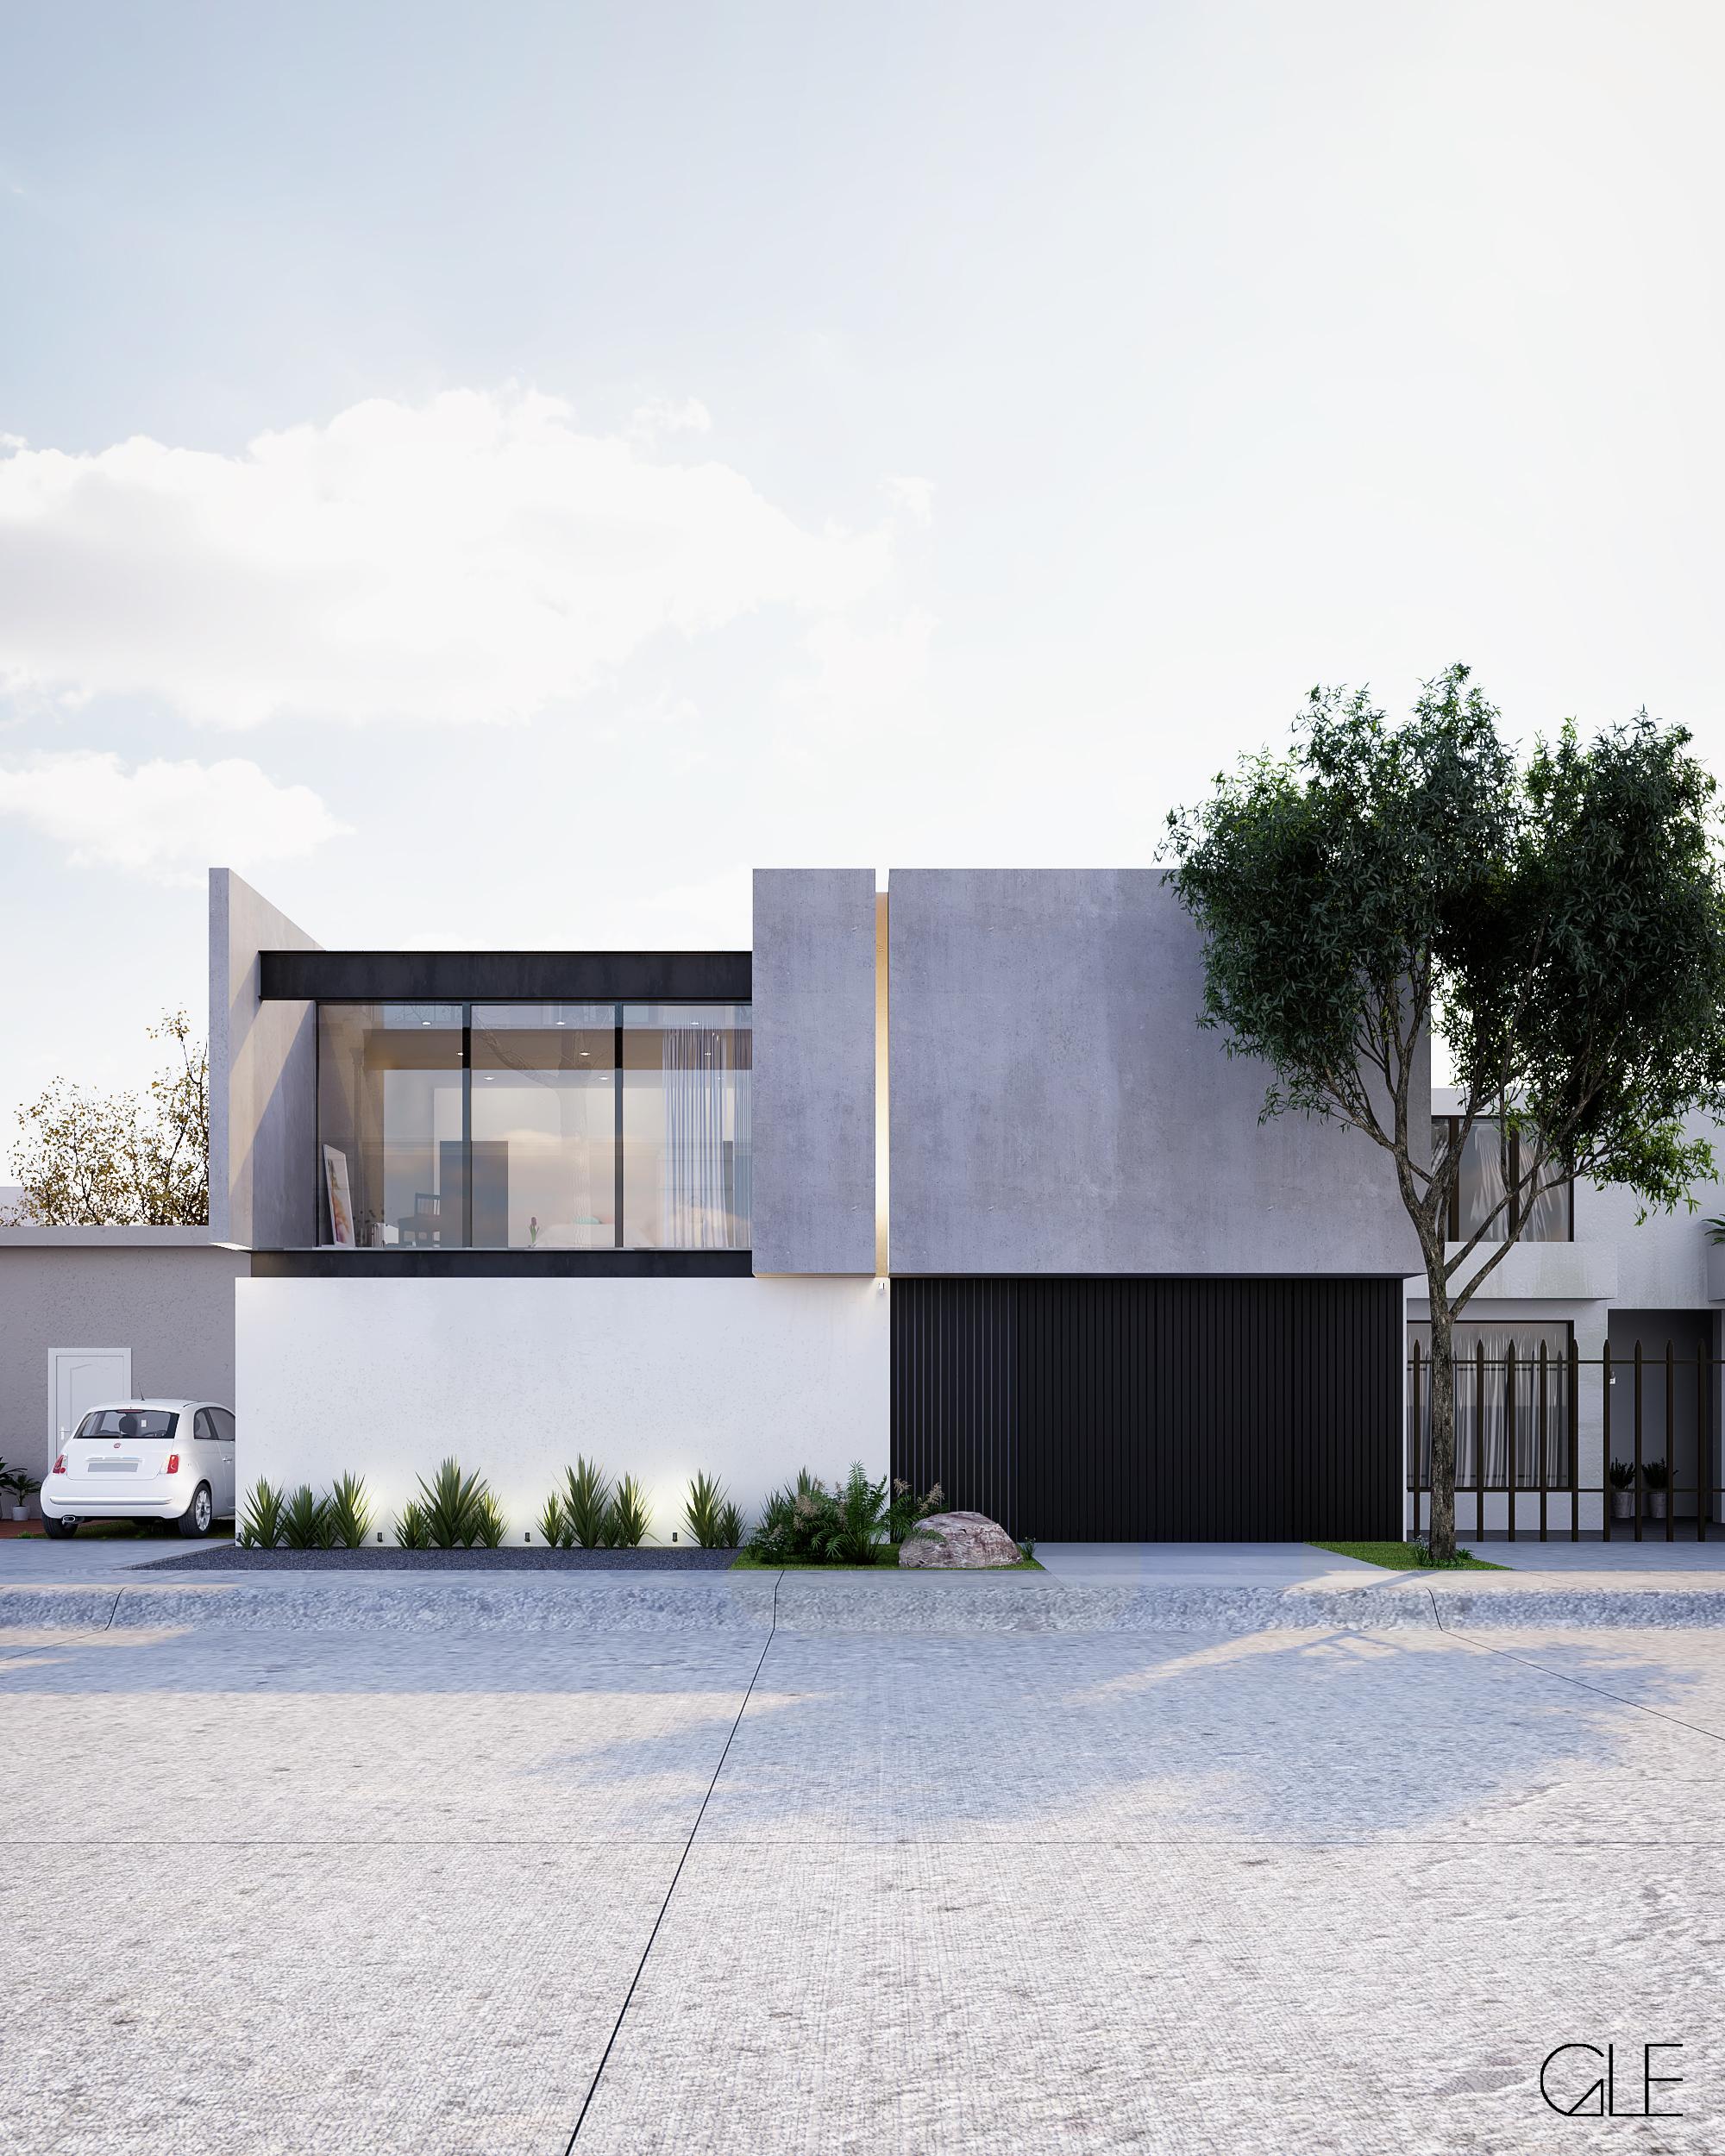 Casa 27 - GLE Arquitectura